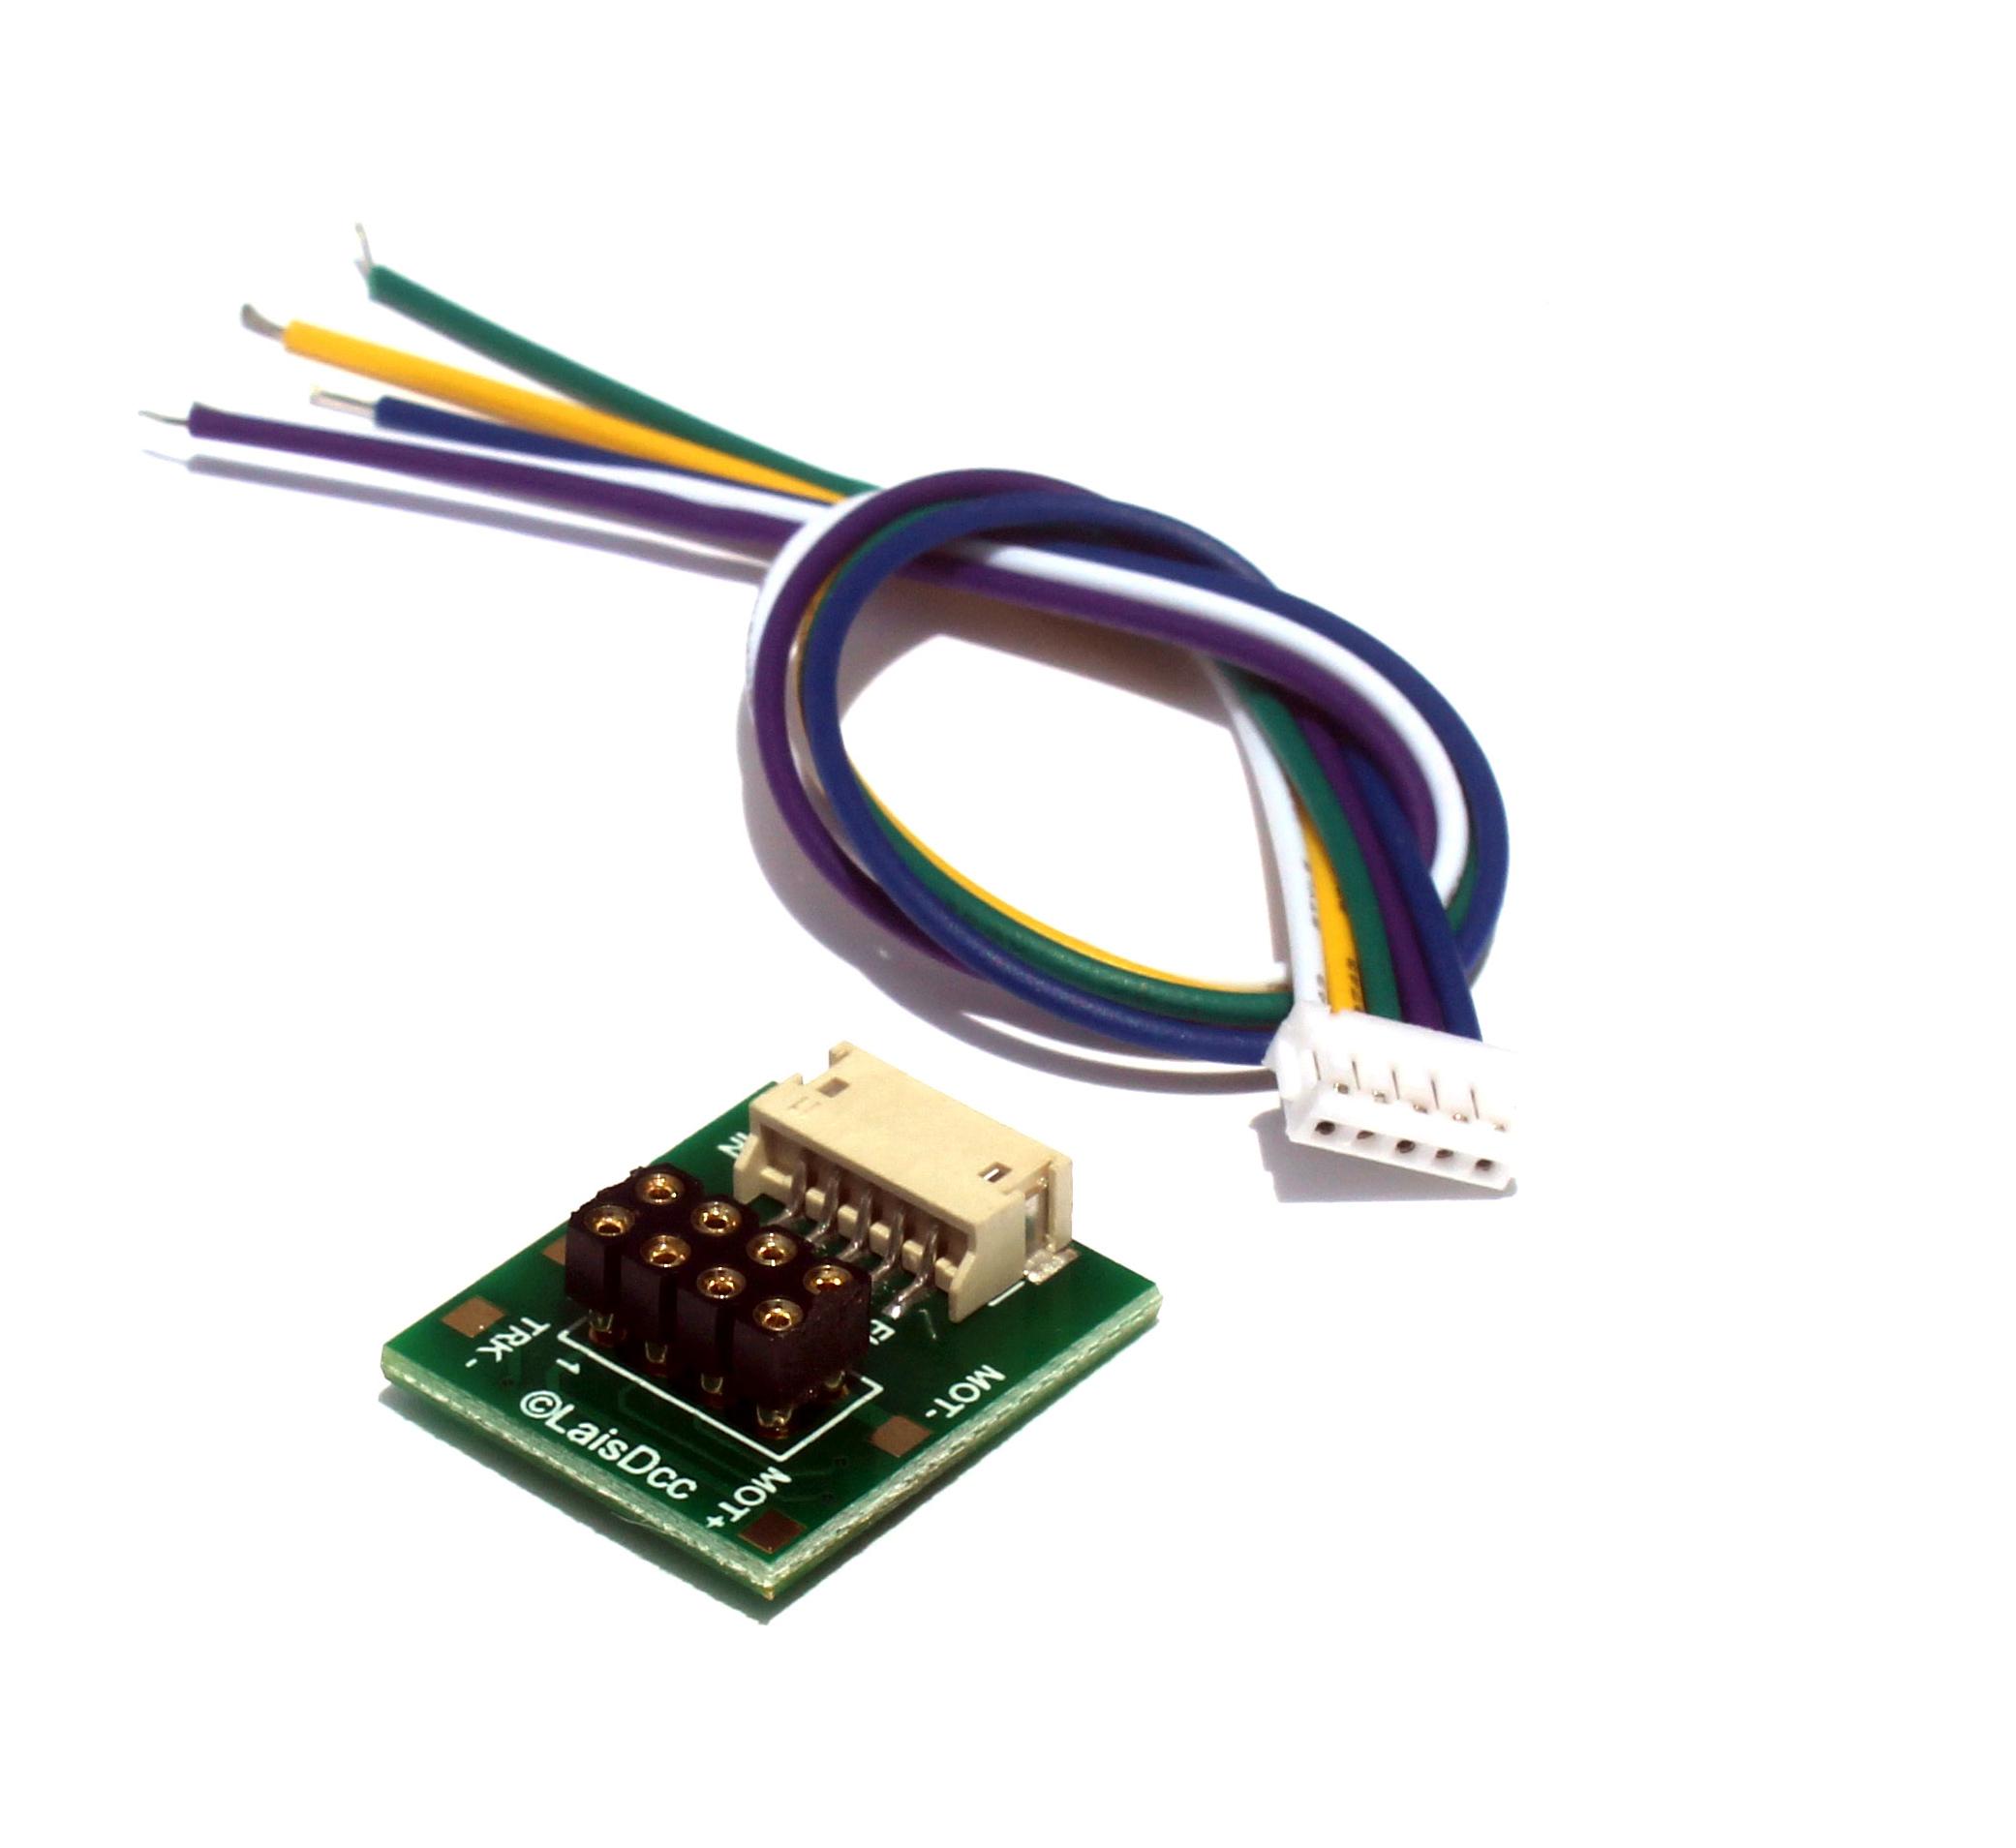 DCC 8 Pin NEM65 Socket with Solder Tabs and 5PIN JST PLUG